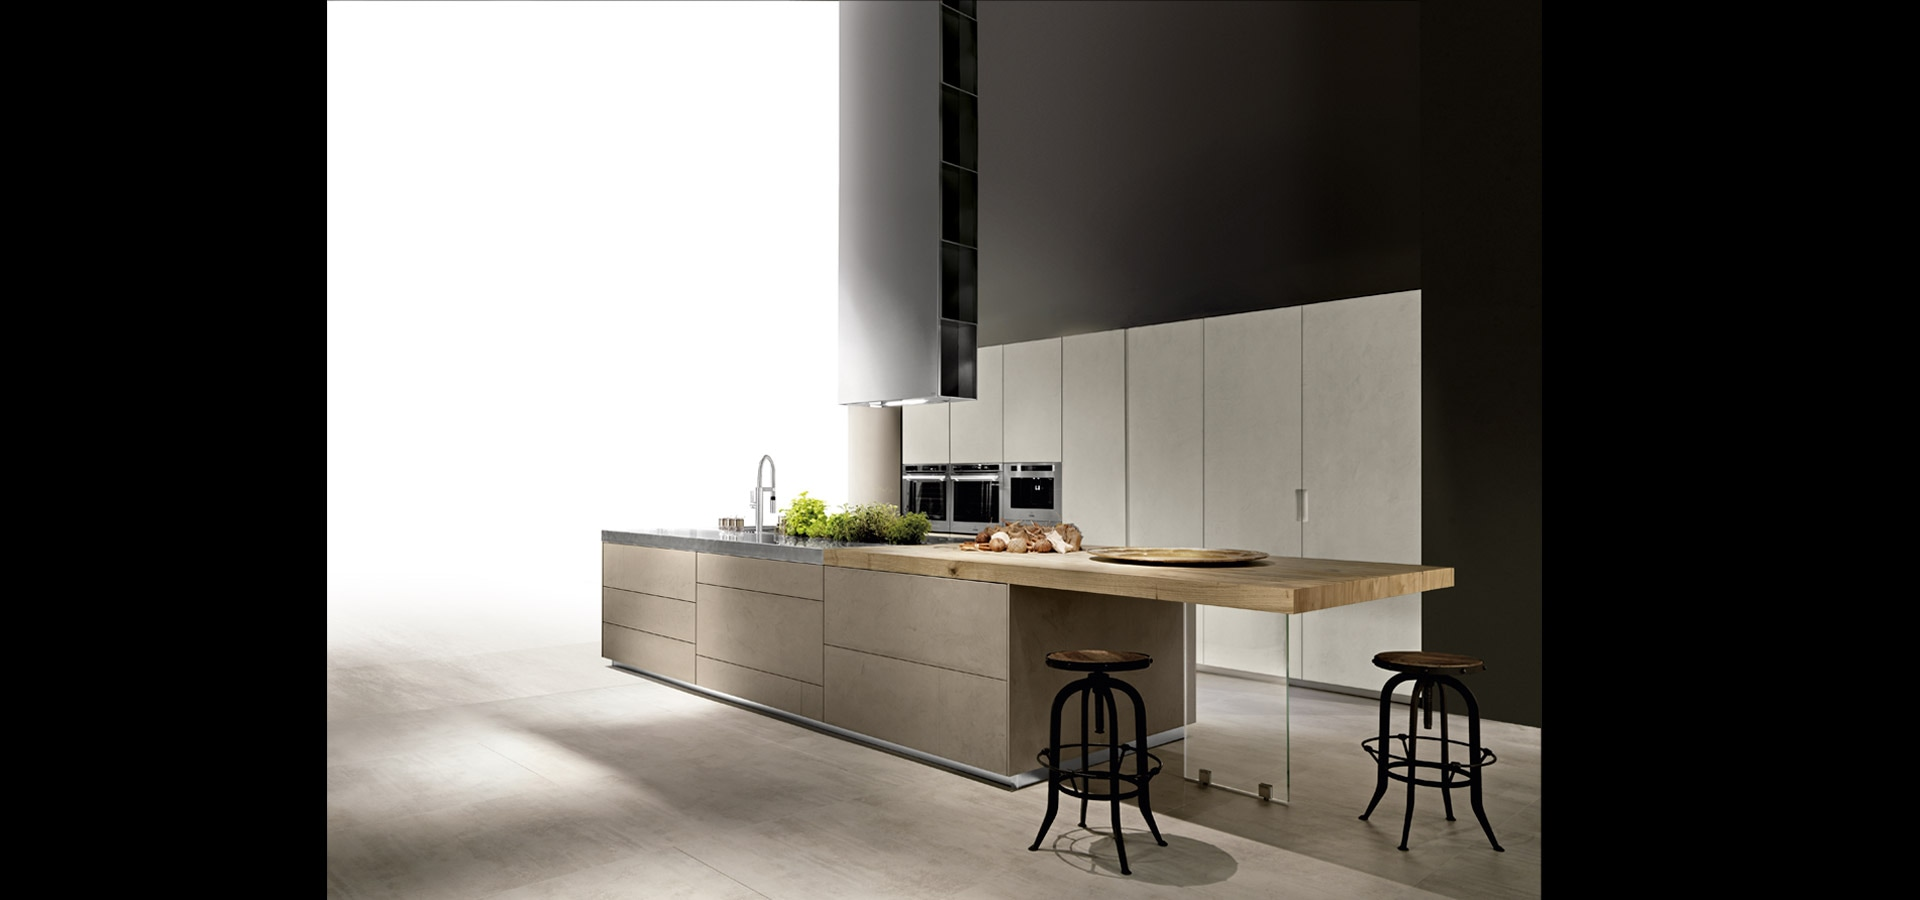 Cucina in cemento Made in Italy | Limha Cemento | MITON Cucine